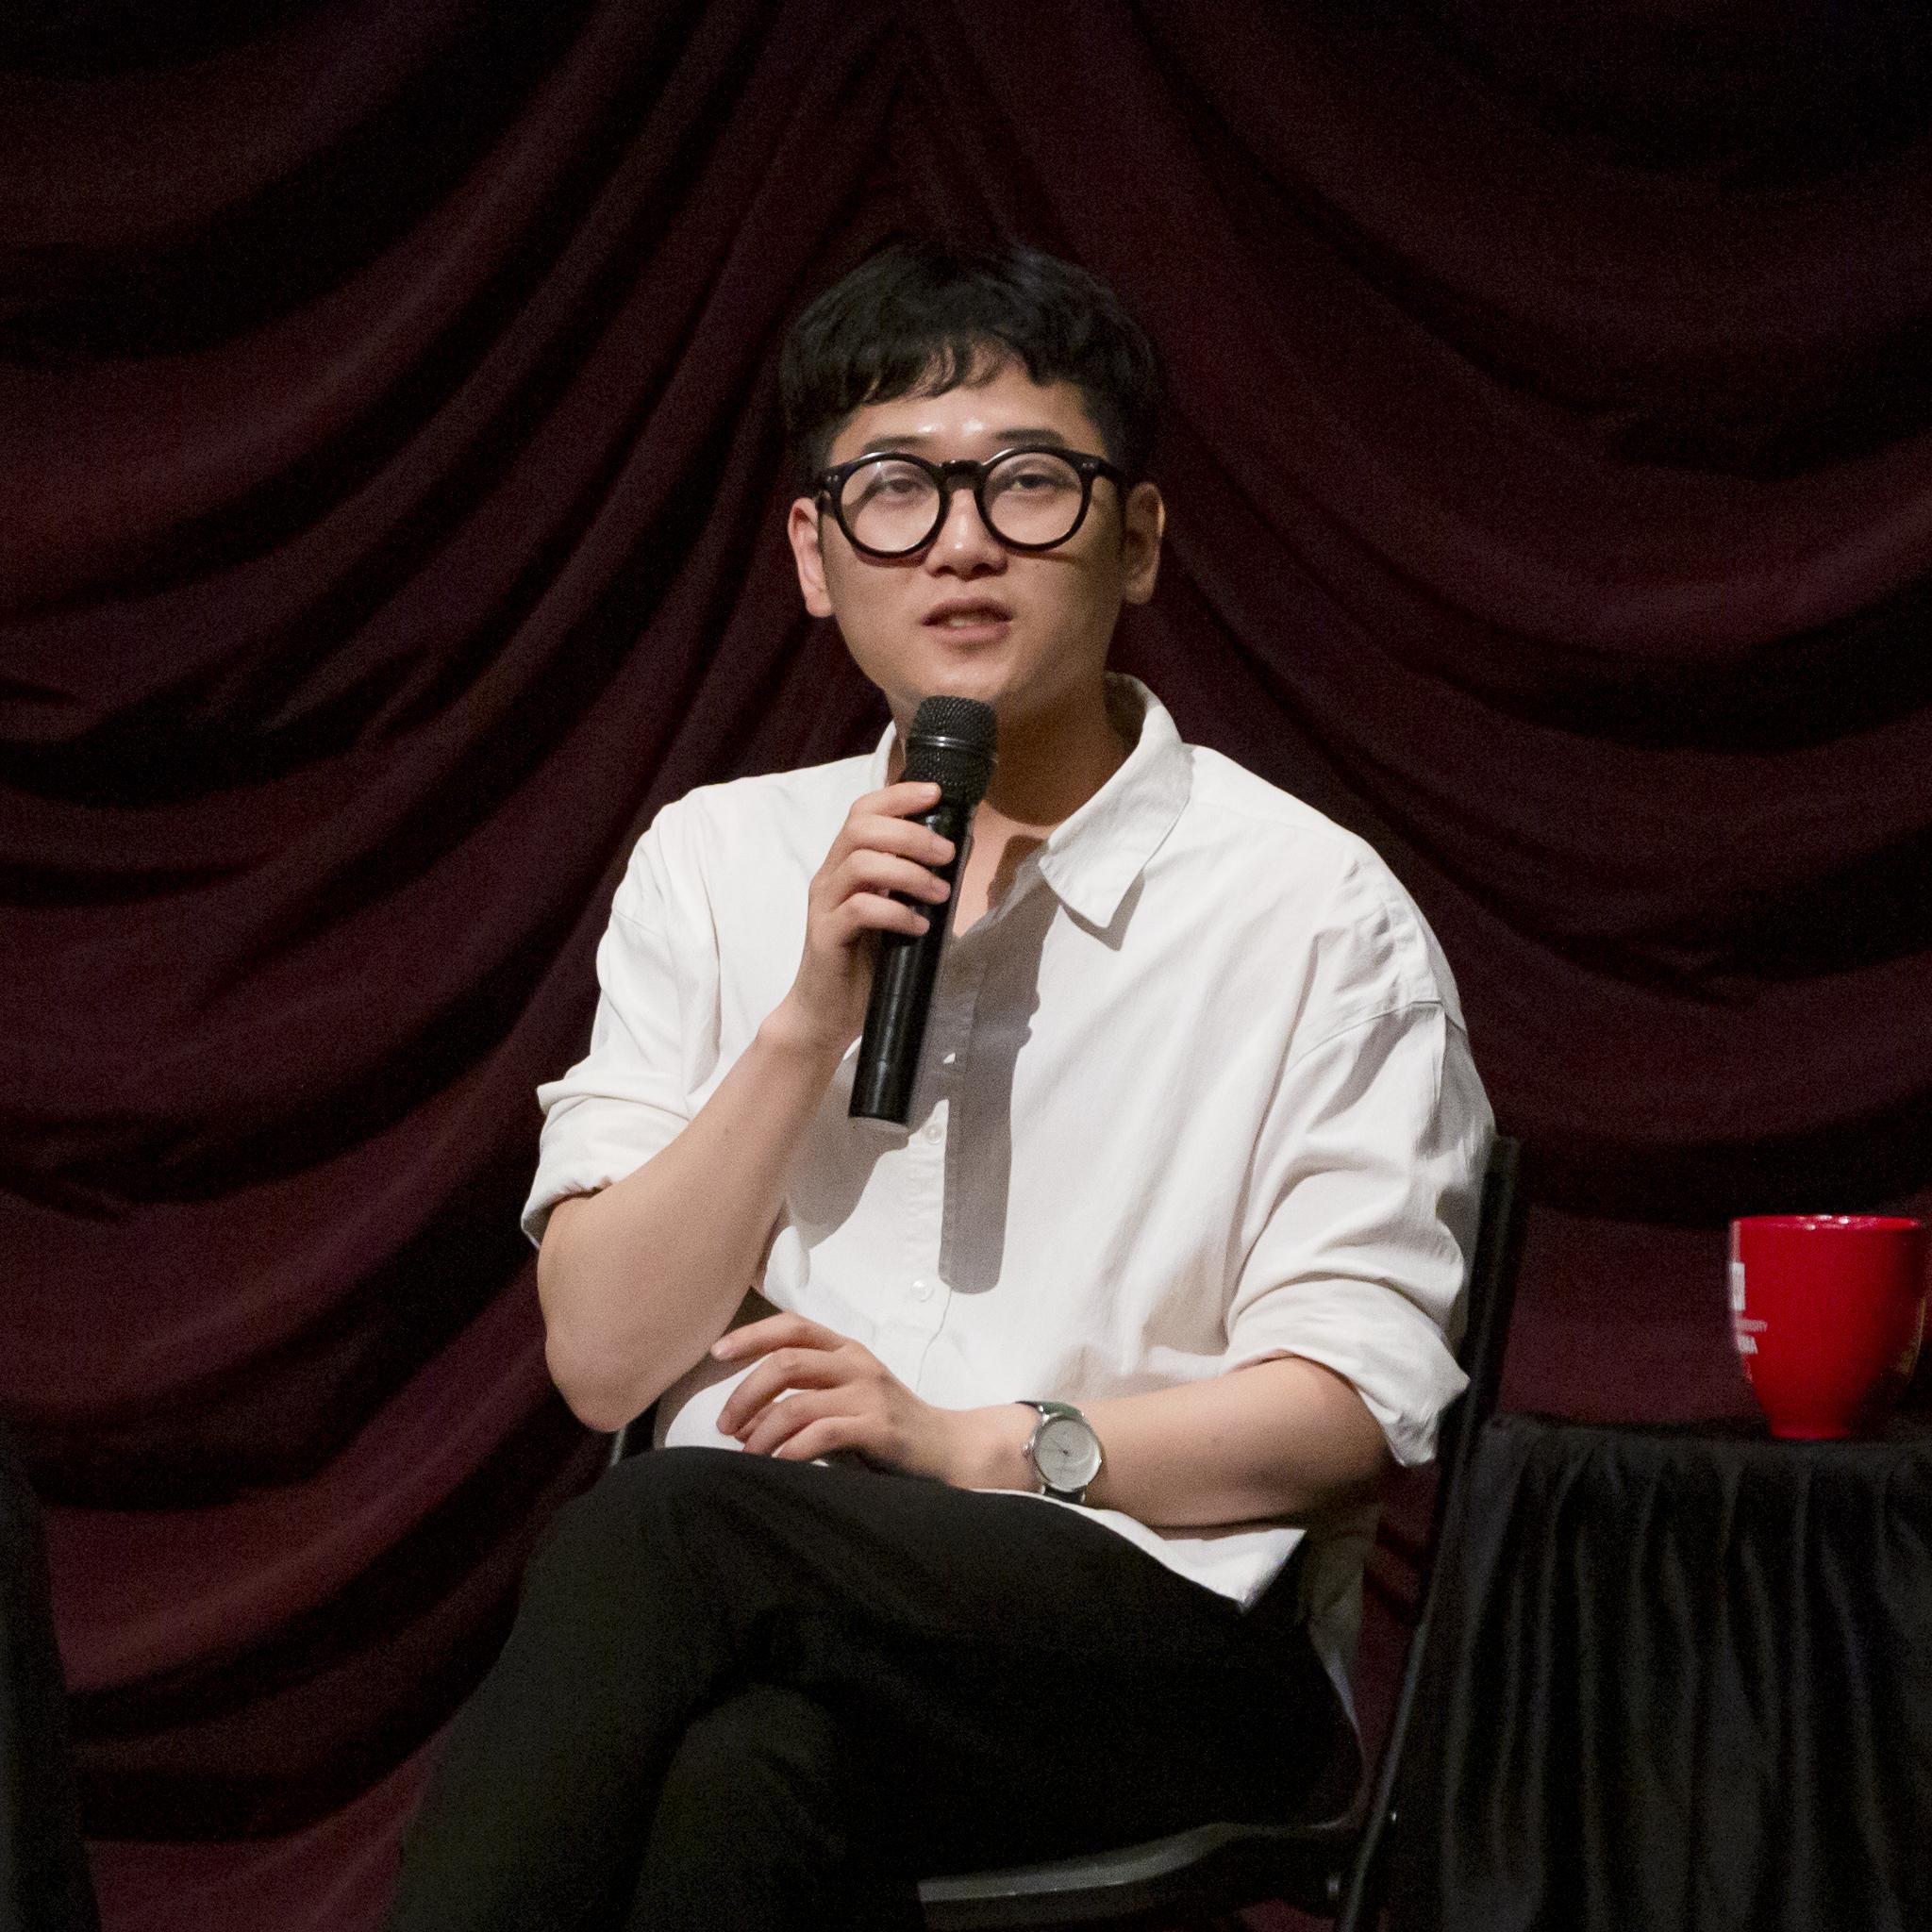 Kyung Mook Kim